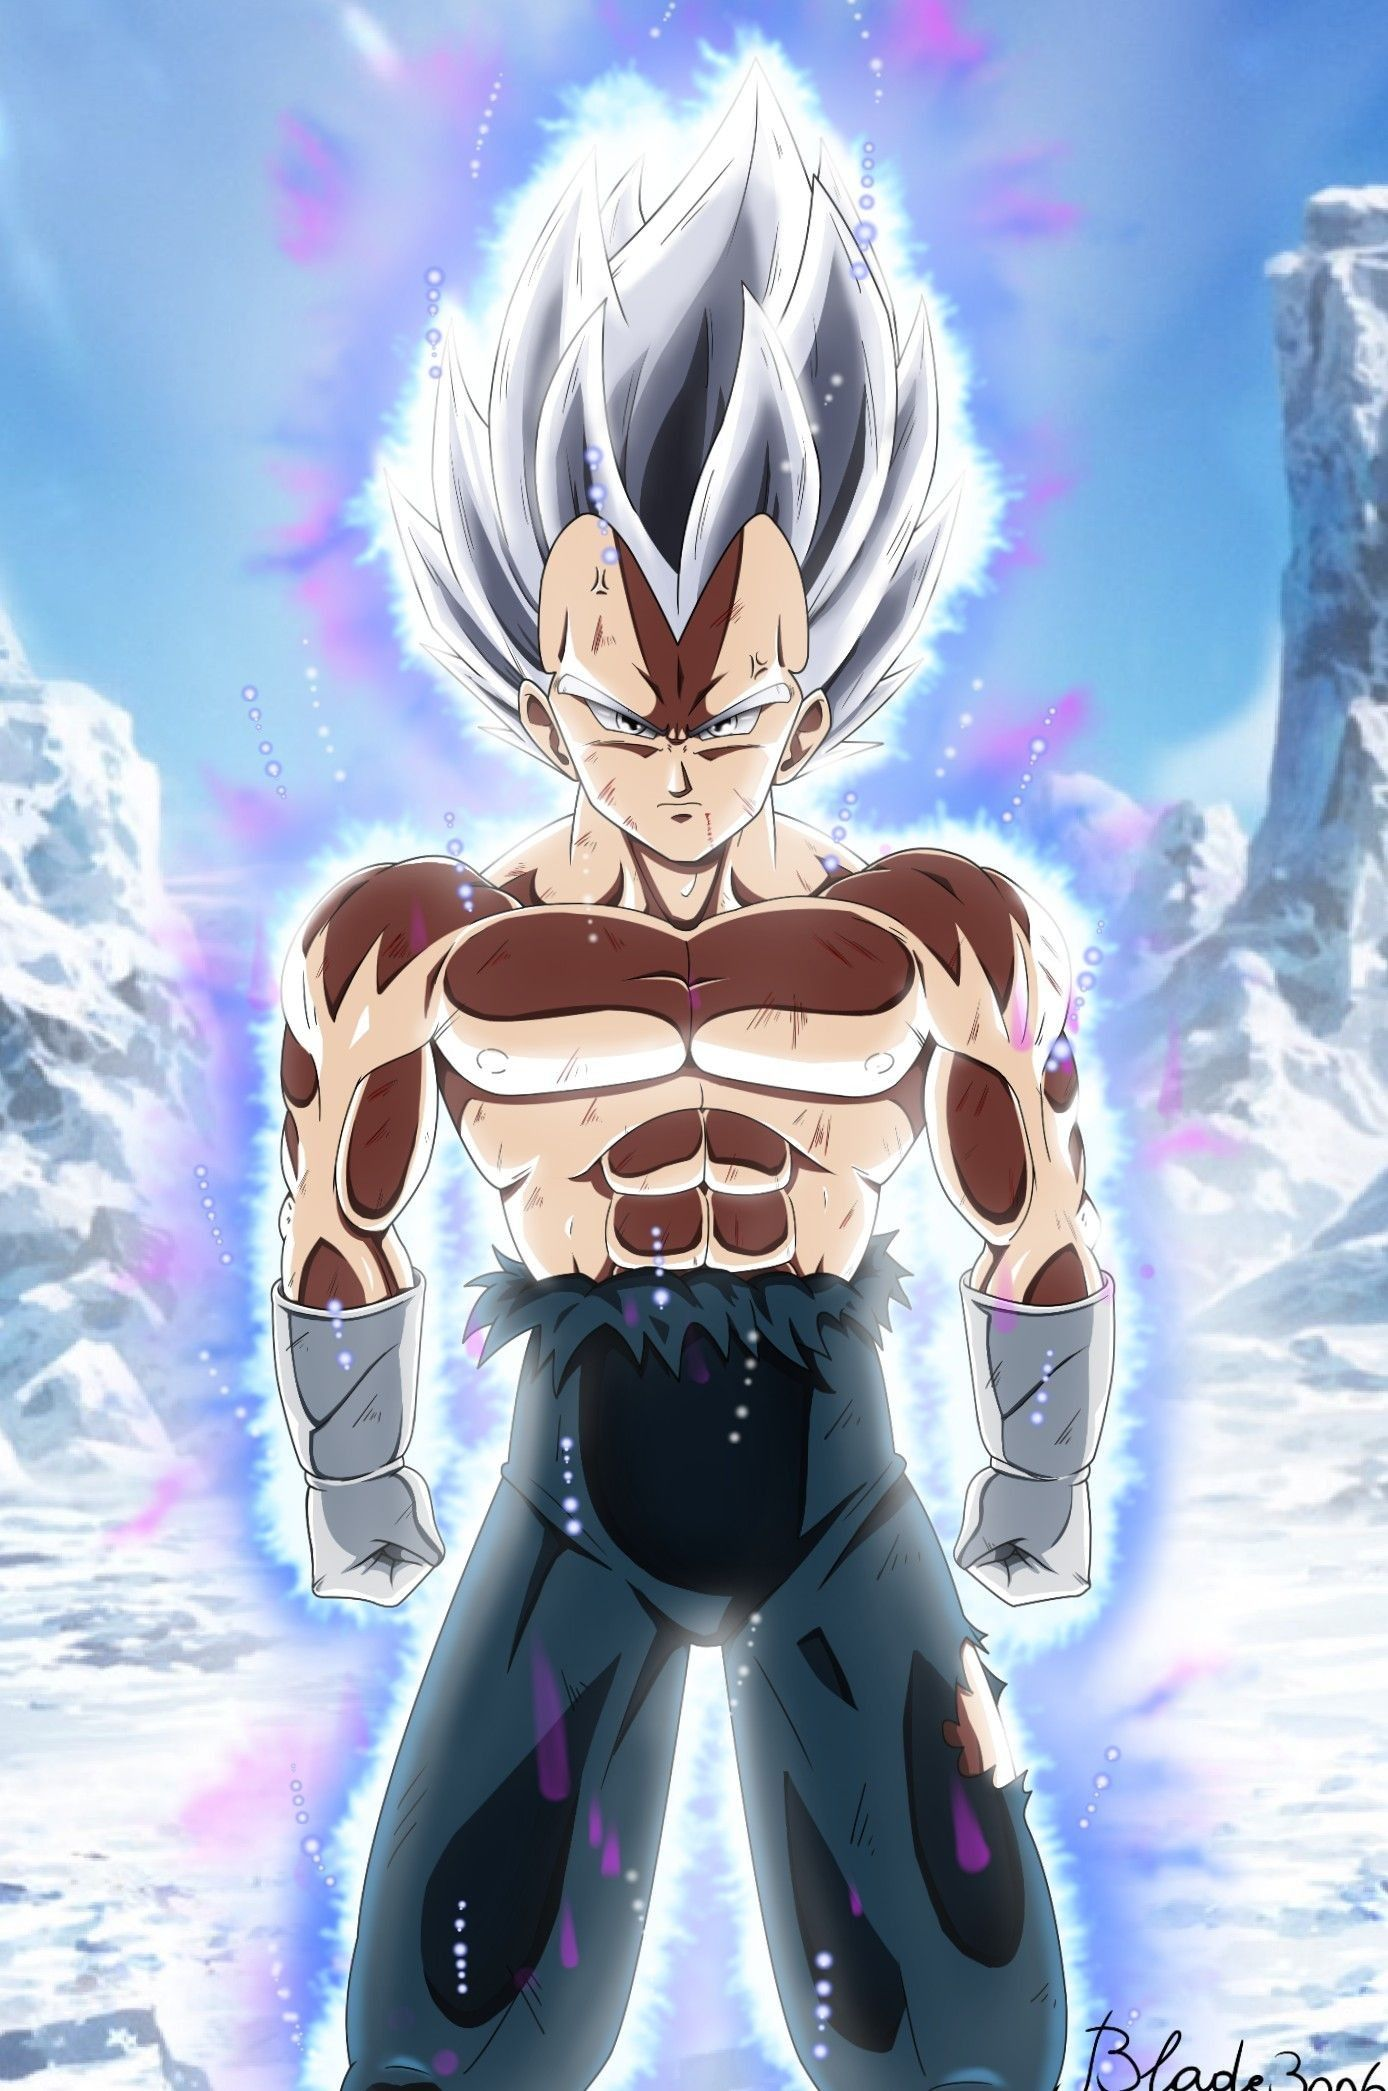 Pin By Travis Rvl On Dragon Ball Super Dragon Ball Super Manga Anime Dragon Ball Super Dragon Ball Super Goku